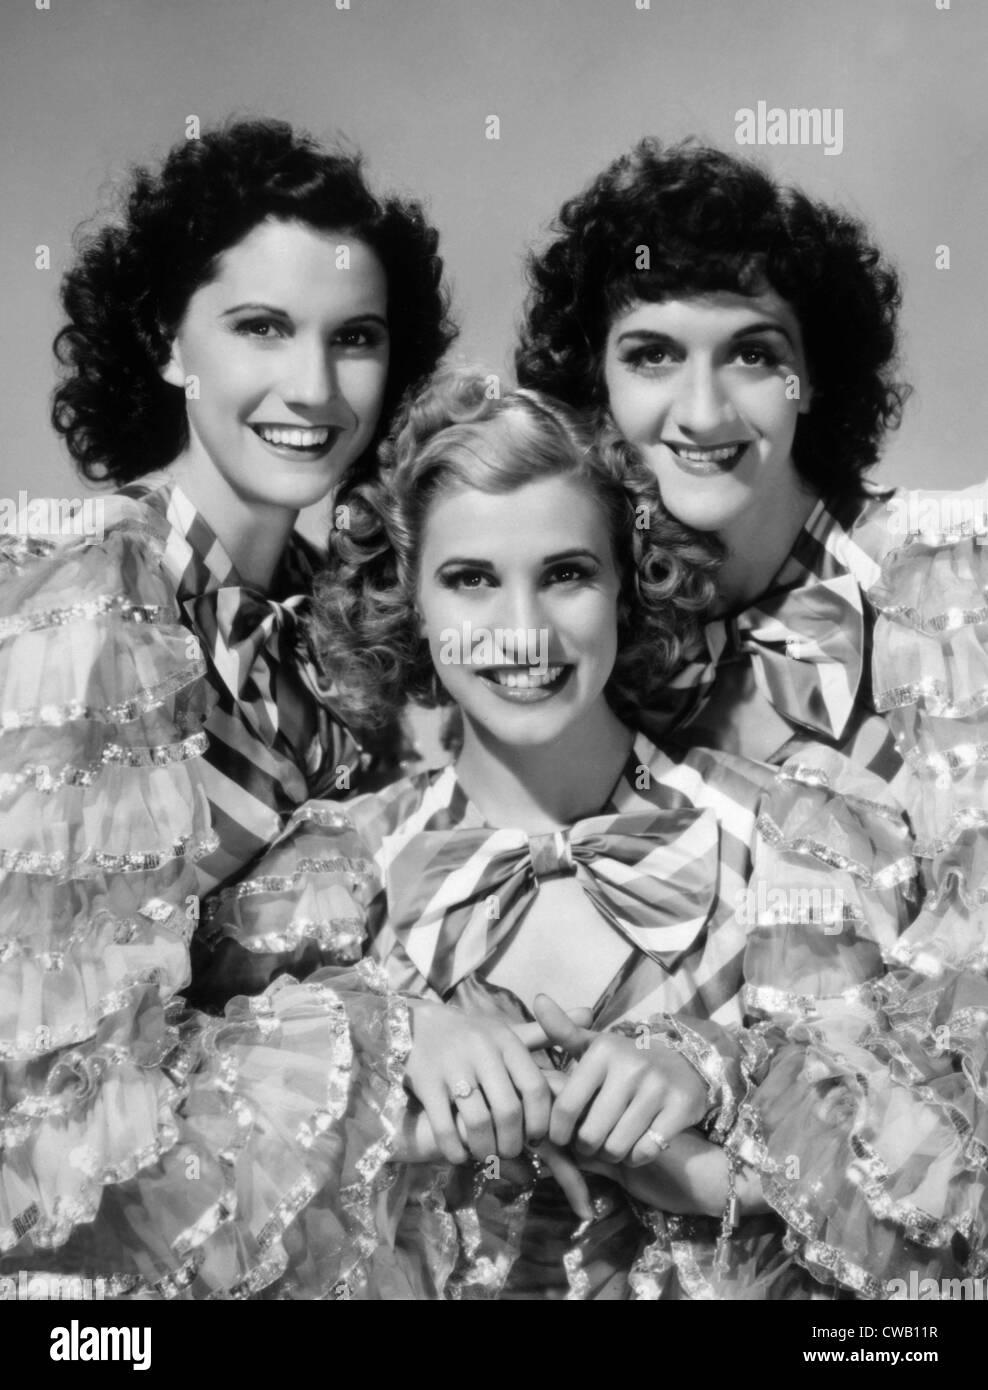 Notti argentino, la Andrews Sorelle, Maxne Andrews, Patty Andrews, LaVerne Andrews, 1940 Immagini Stock